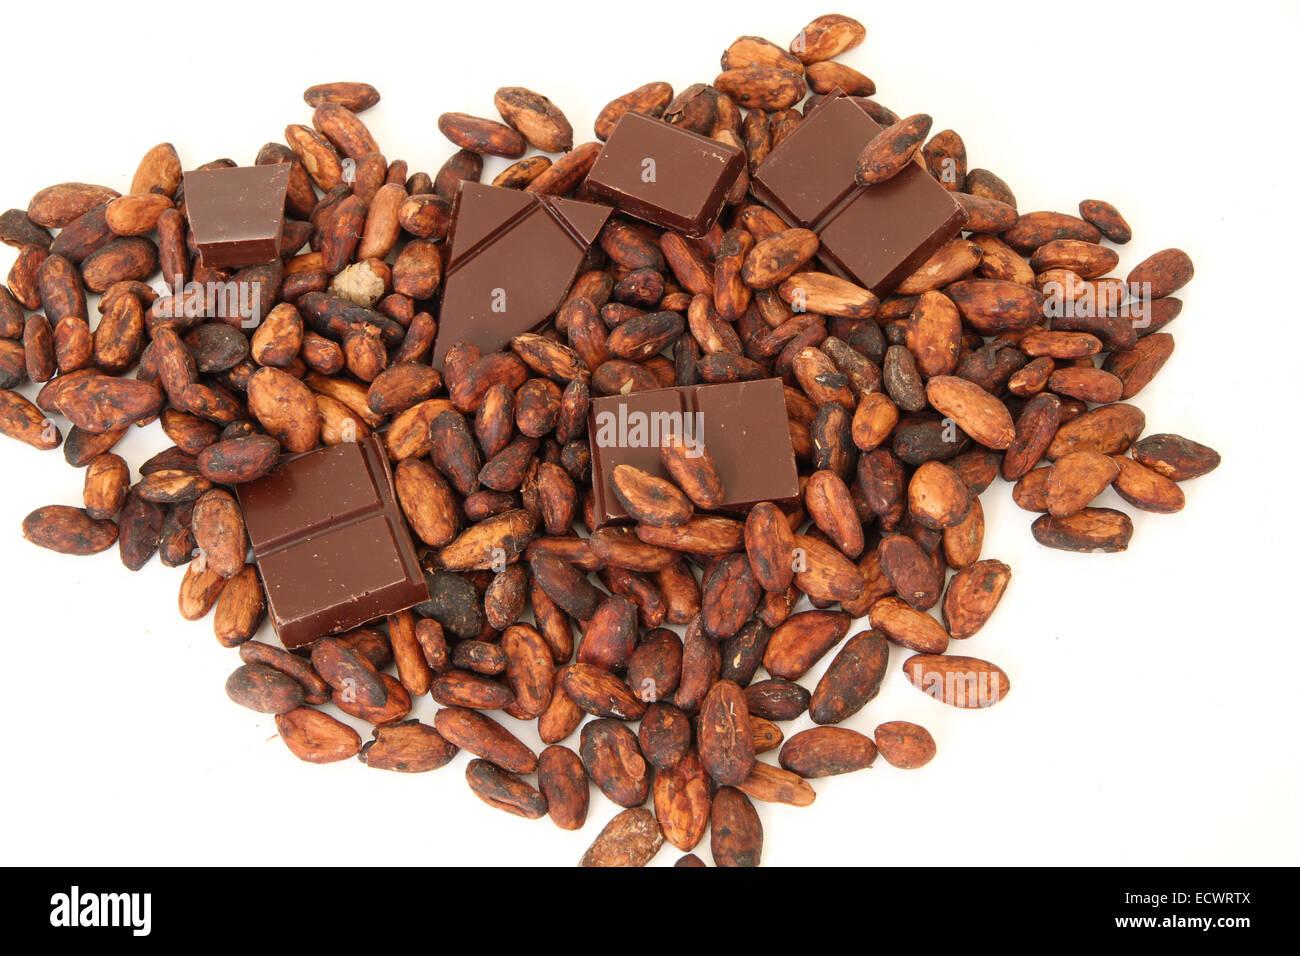 fine origin dark chocolate bar with cocoa beans - Stock Image